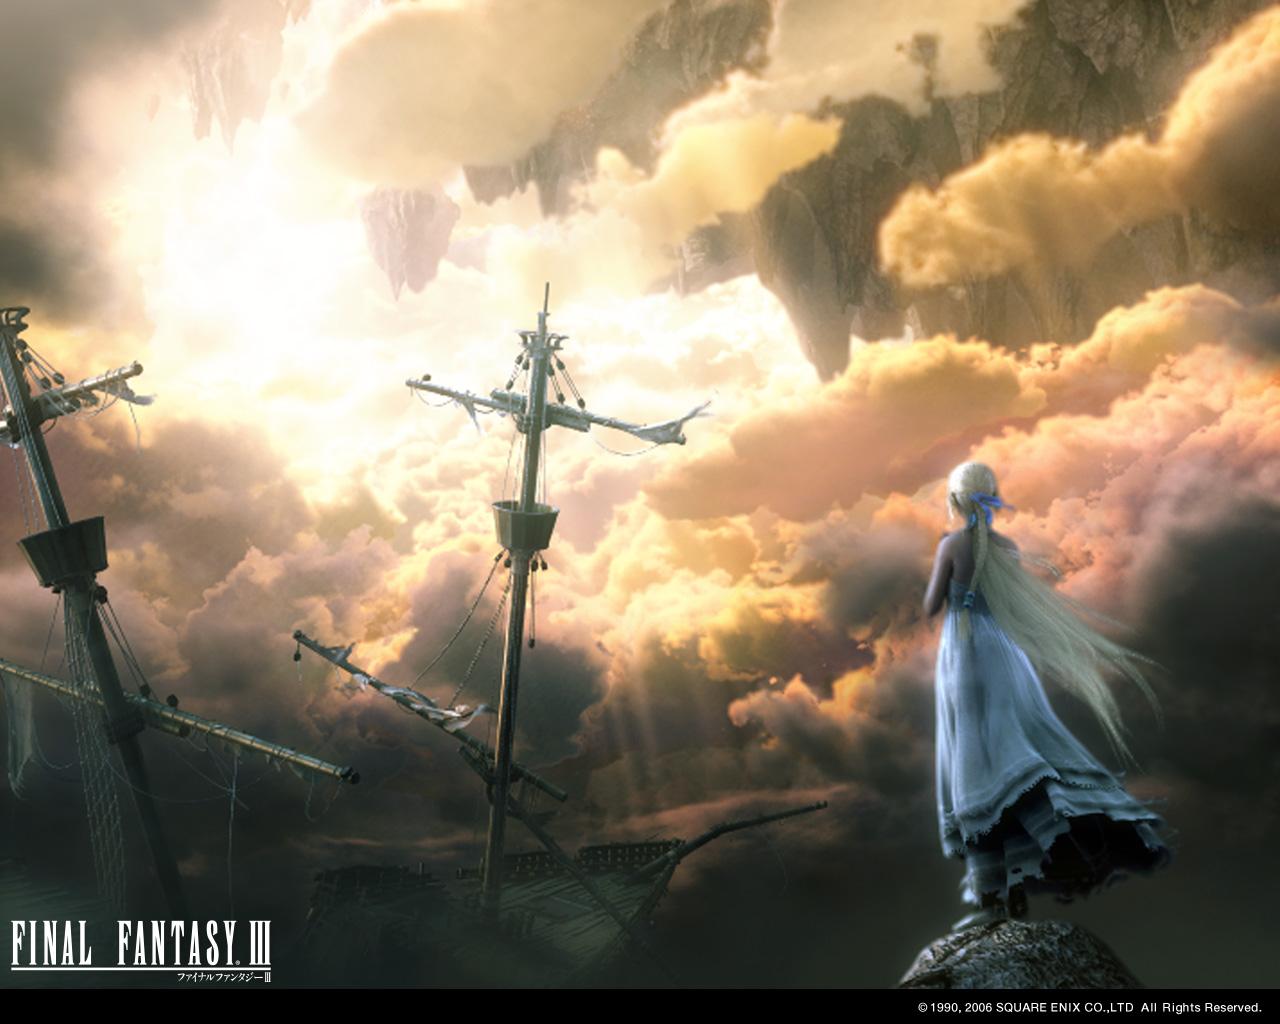 Final Kingdom Final Fantasy wallpapers 1280x1024